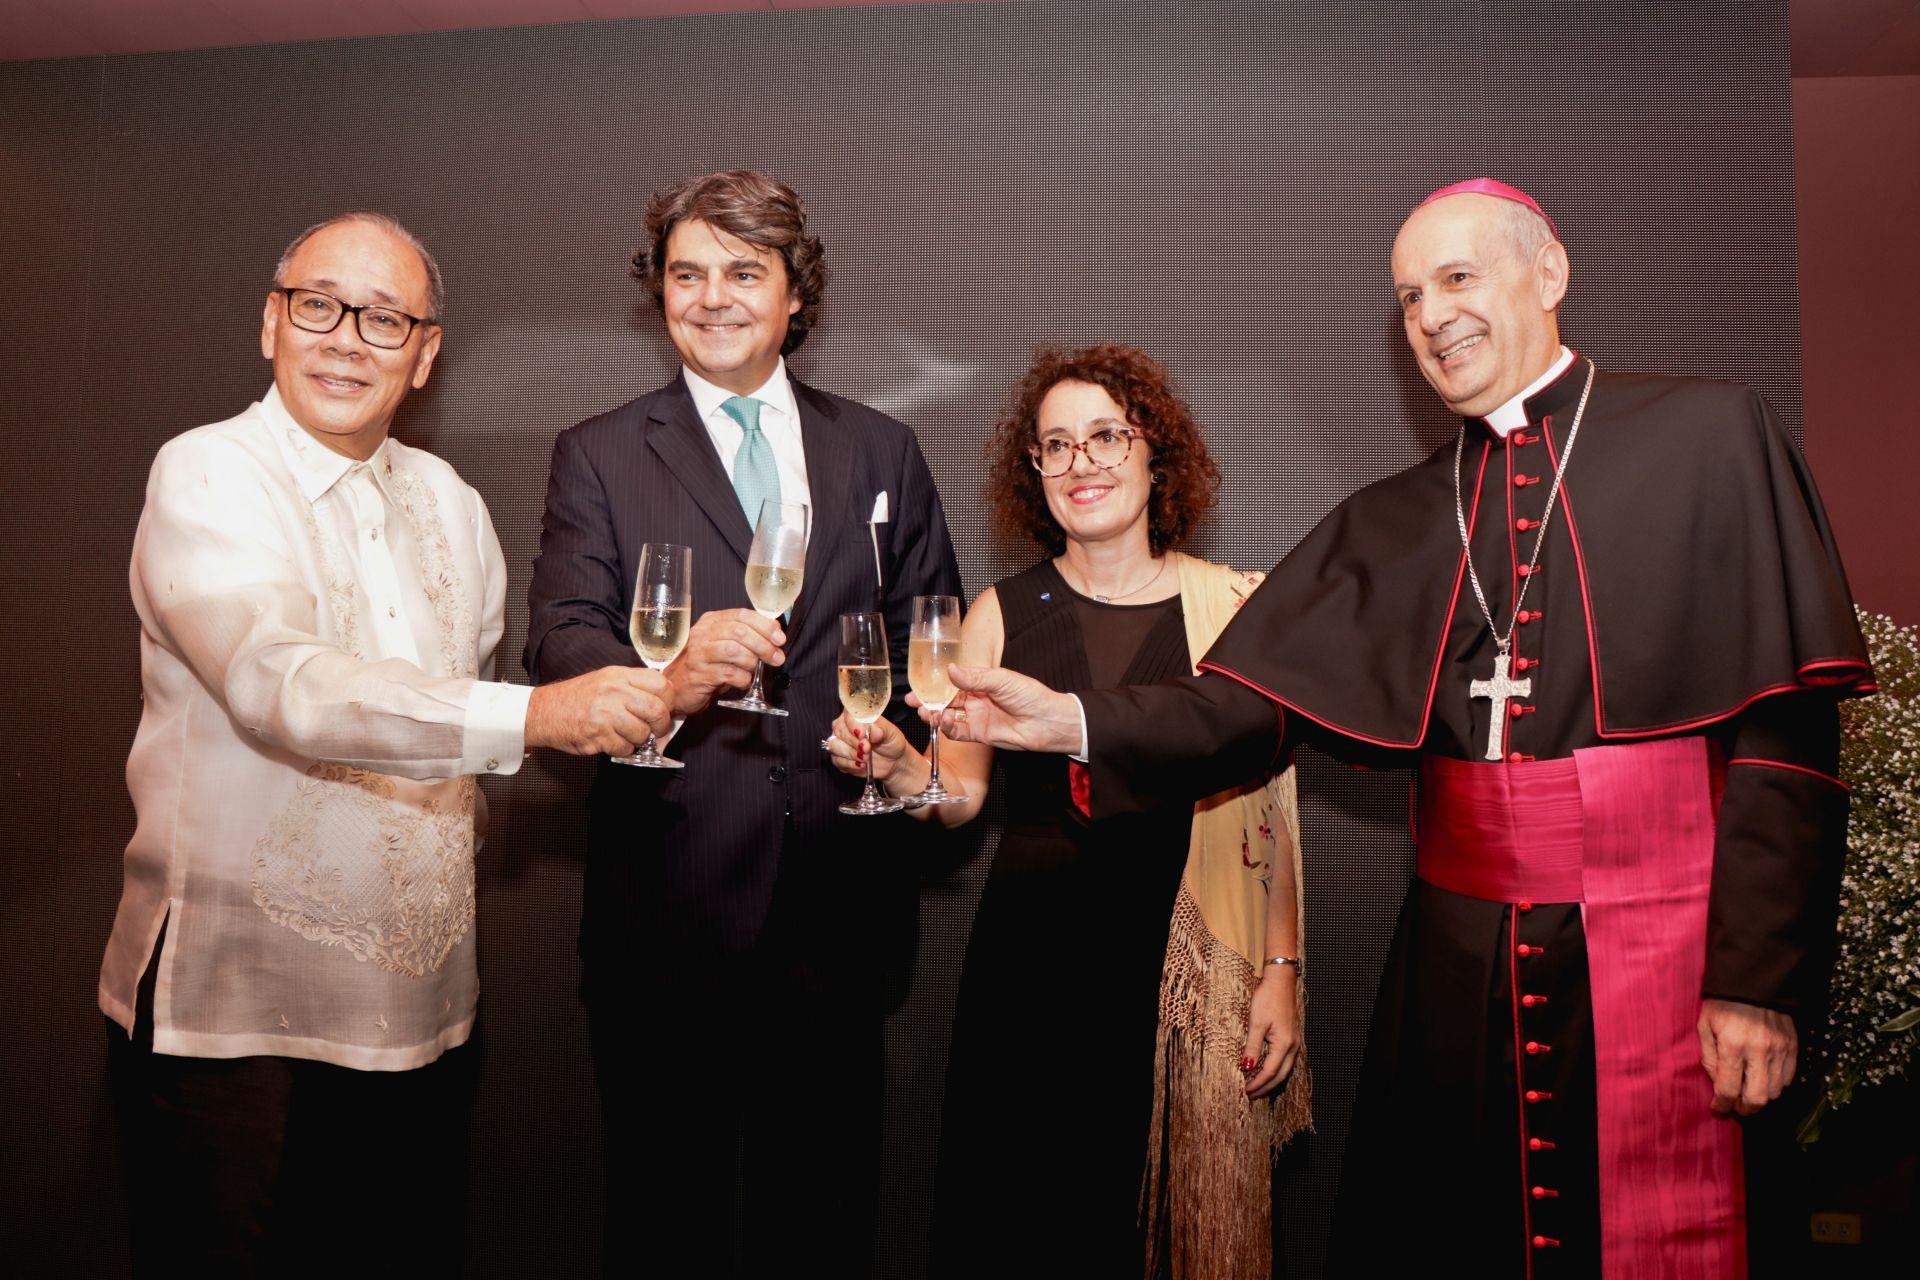 Embassy Of Spain Hosts A Celebration Of Fiesta Nacional de España At The Ambassador's Residence